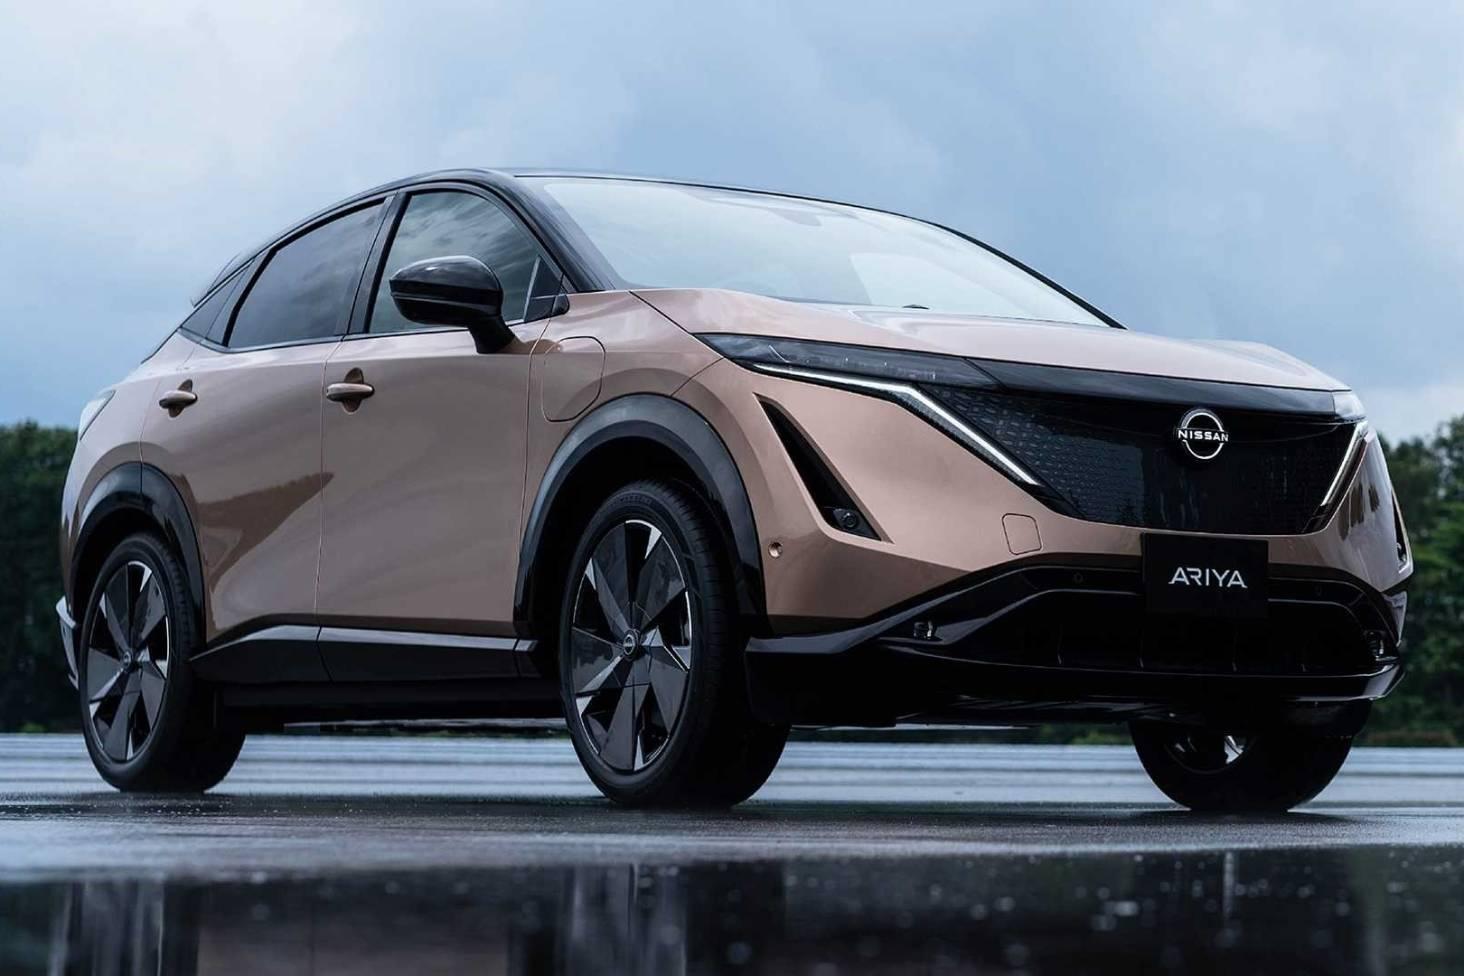 Nissan Reveals Production Ready Ariya Electric Suv Stuff Co Nz